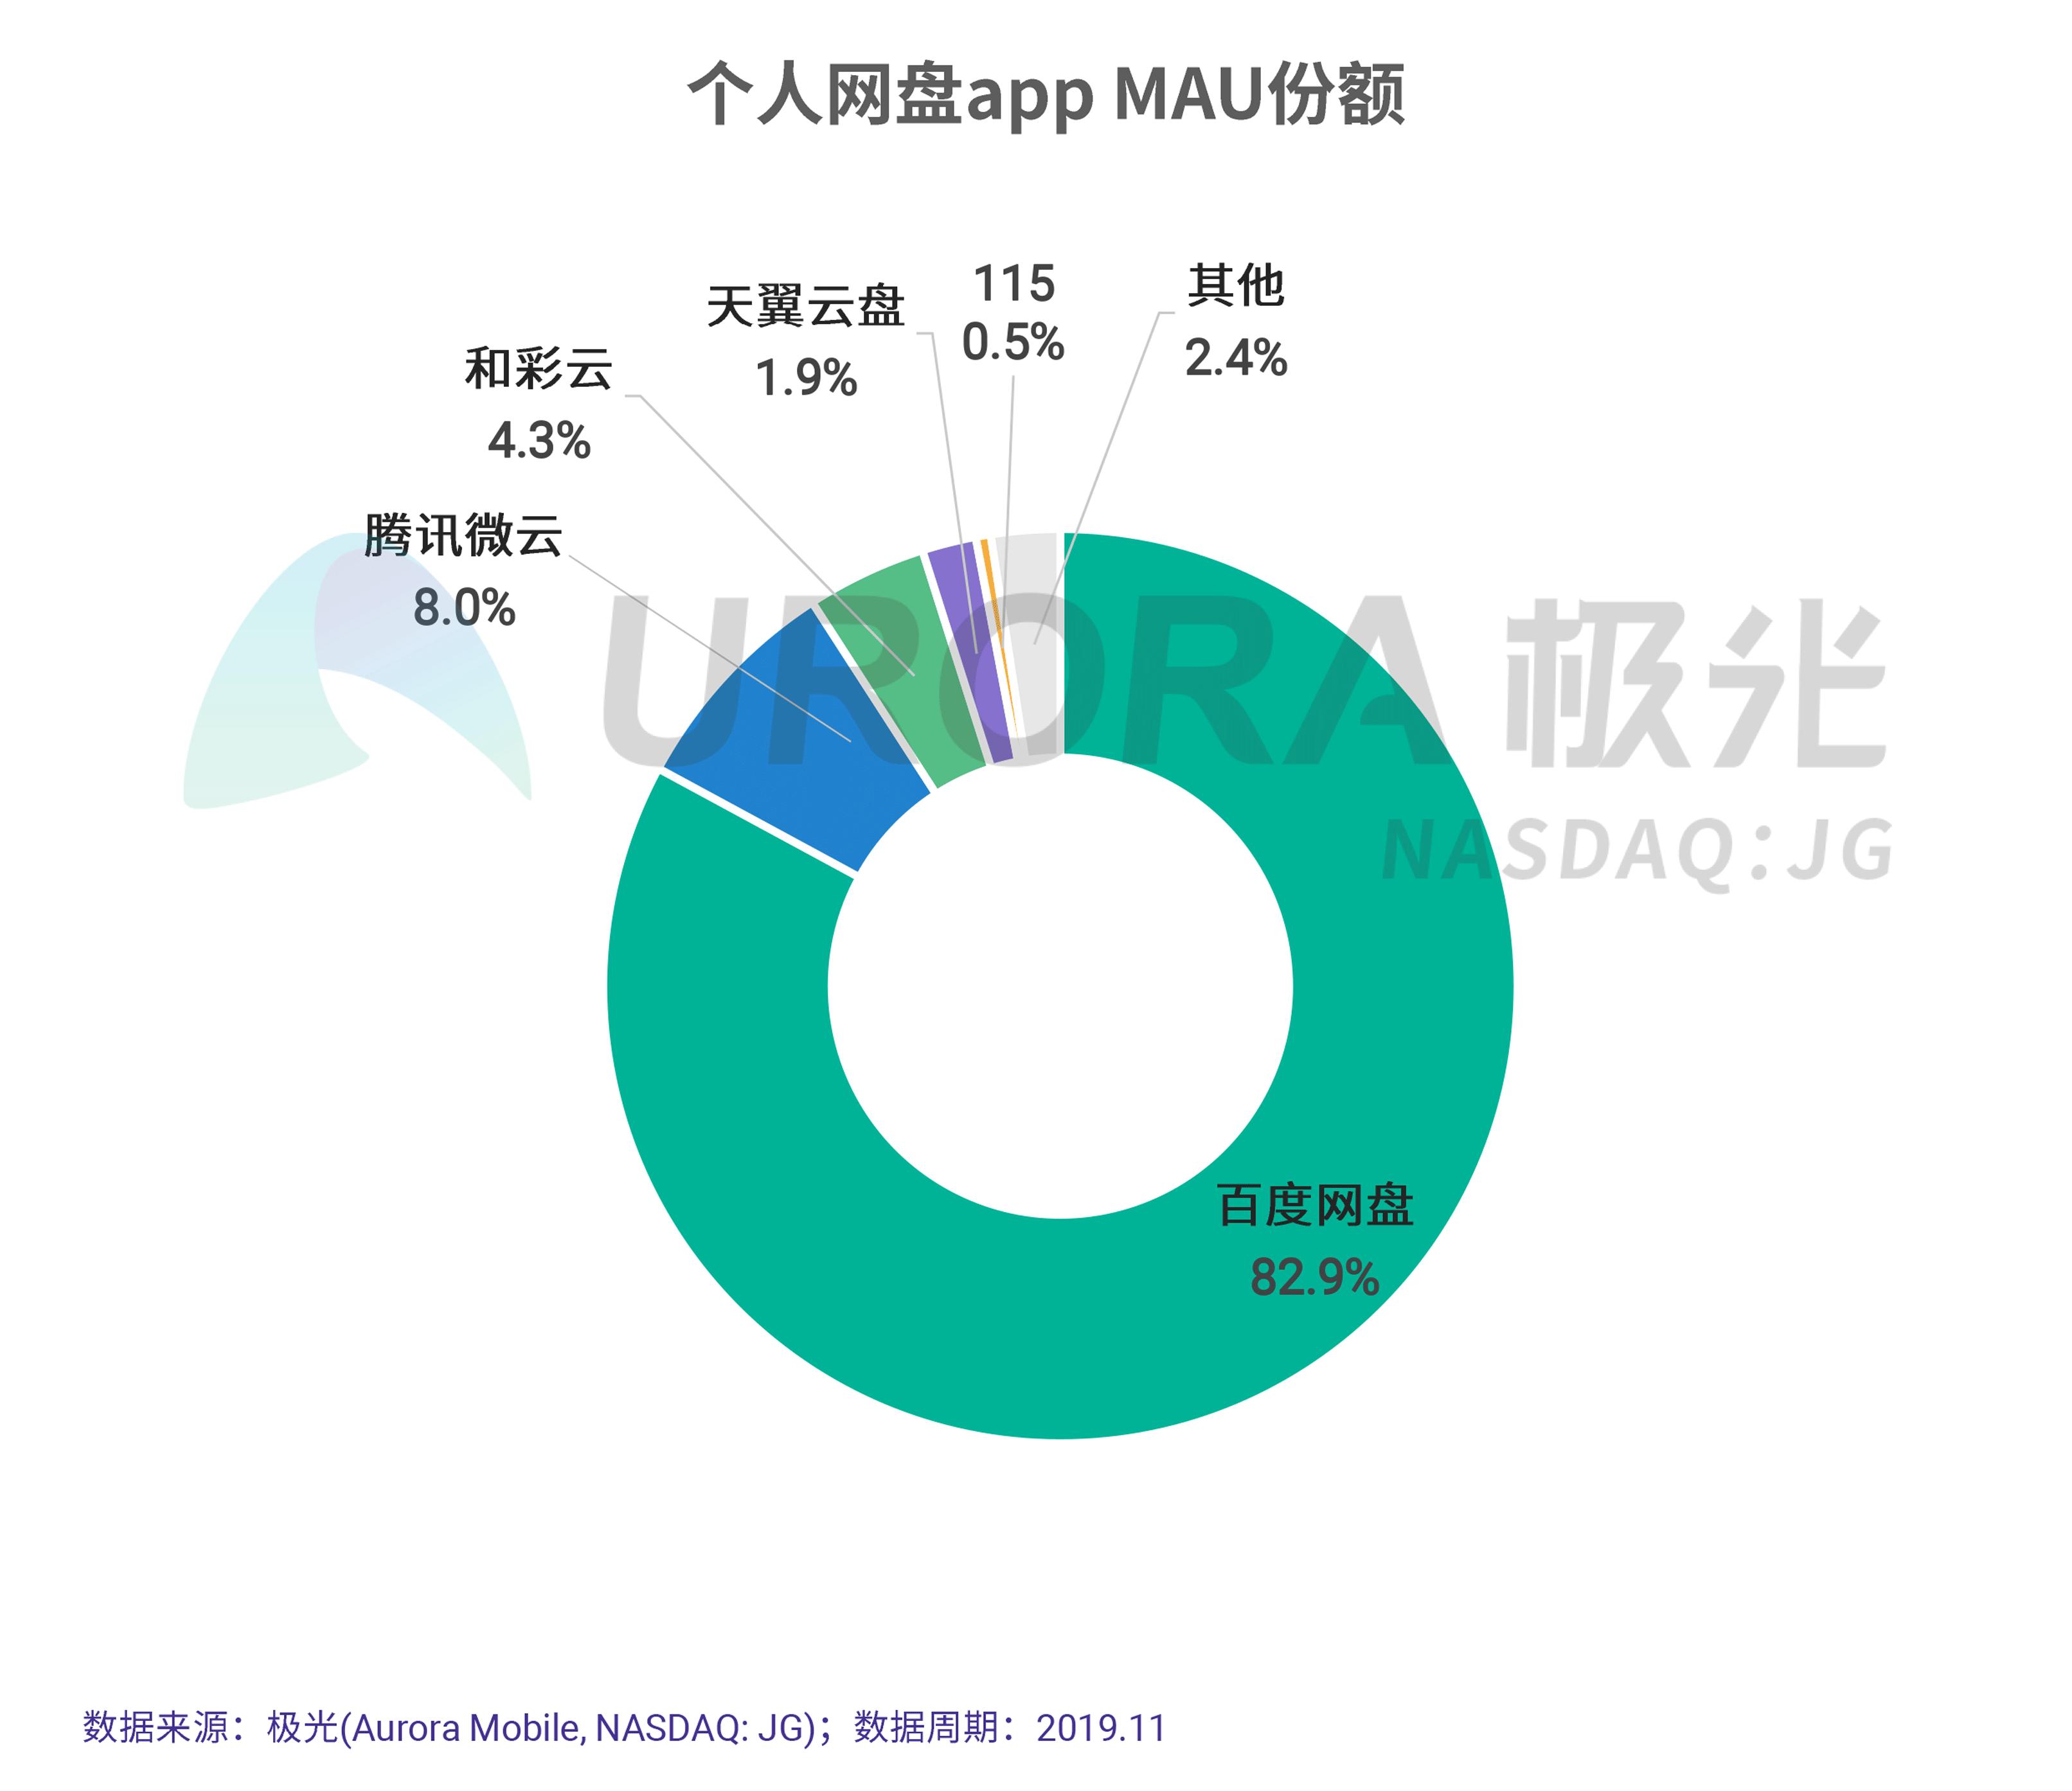 JIGUANG-个人网盘行业研究报告-final---切图版2-13.png